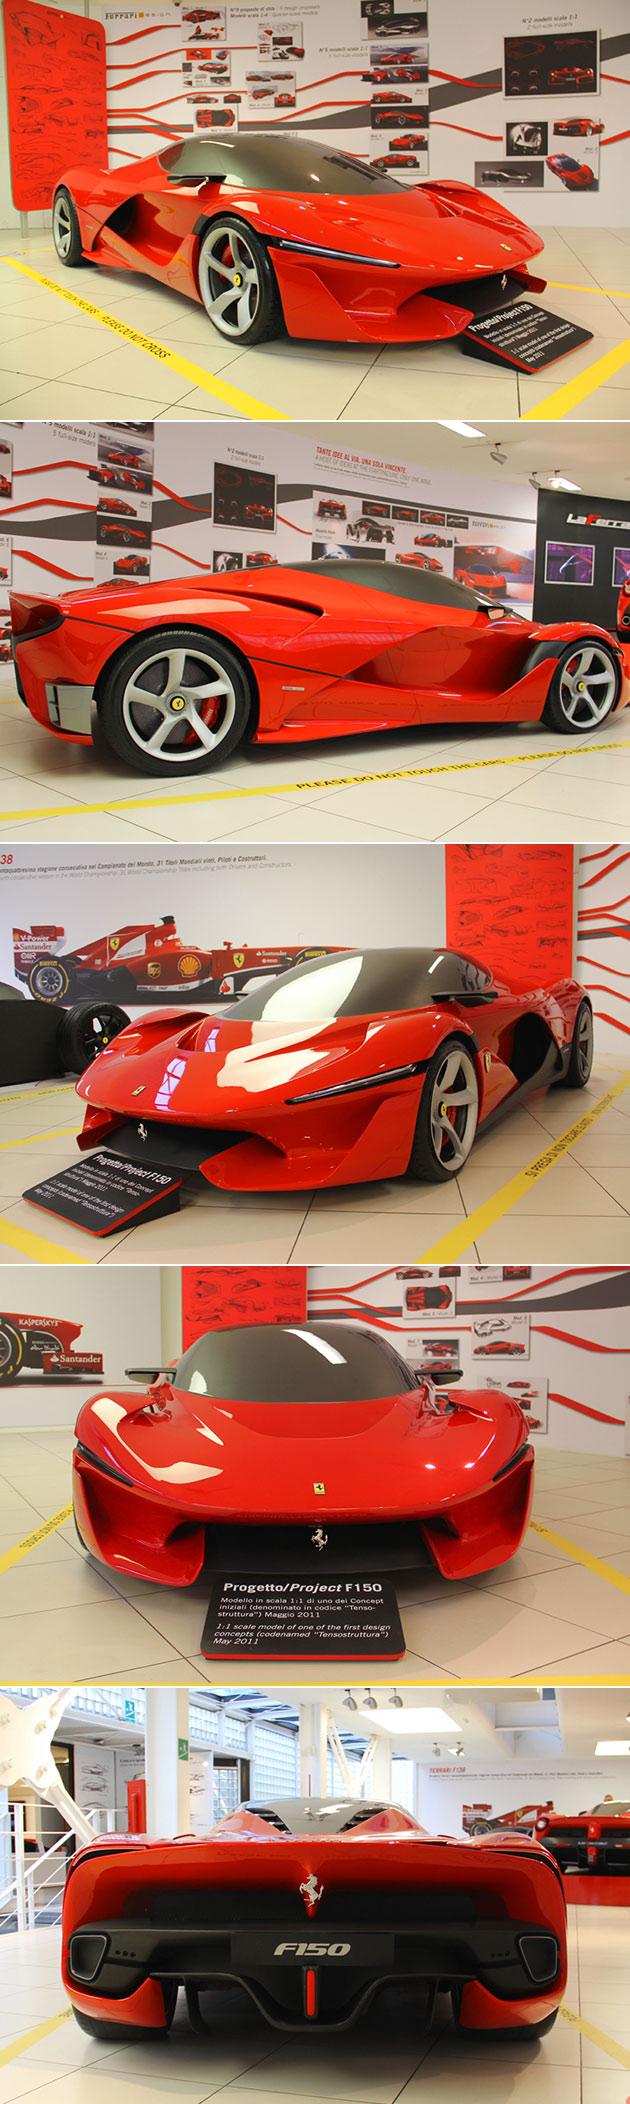 Ferrari F150 Concept